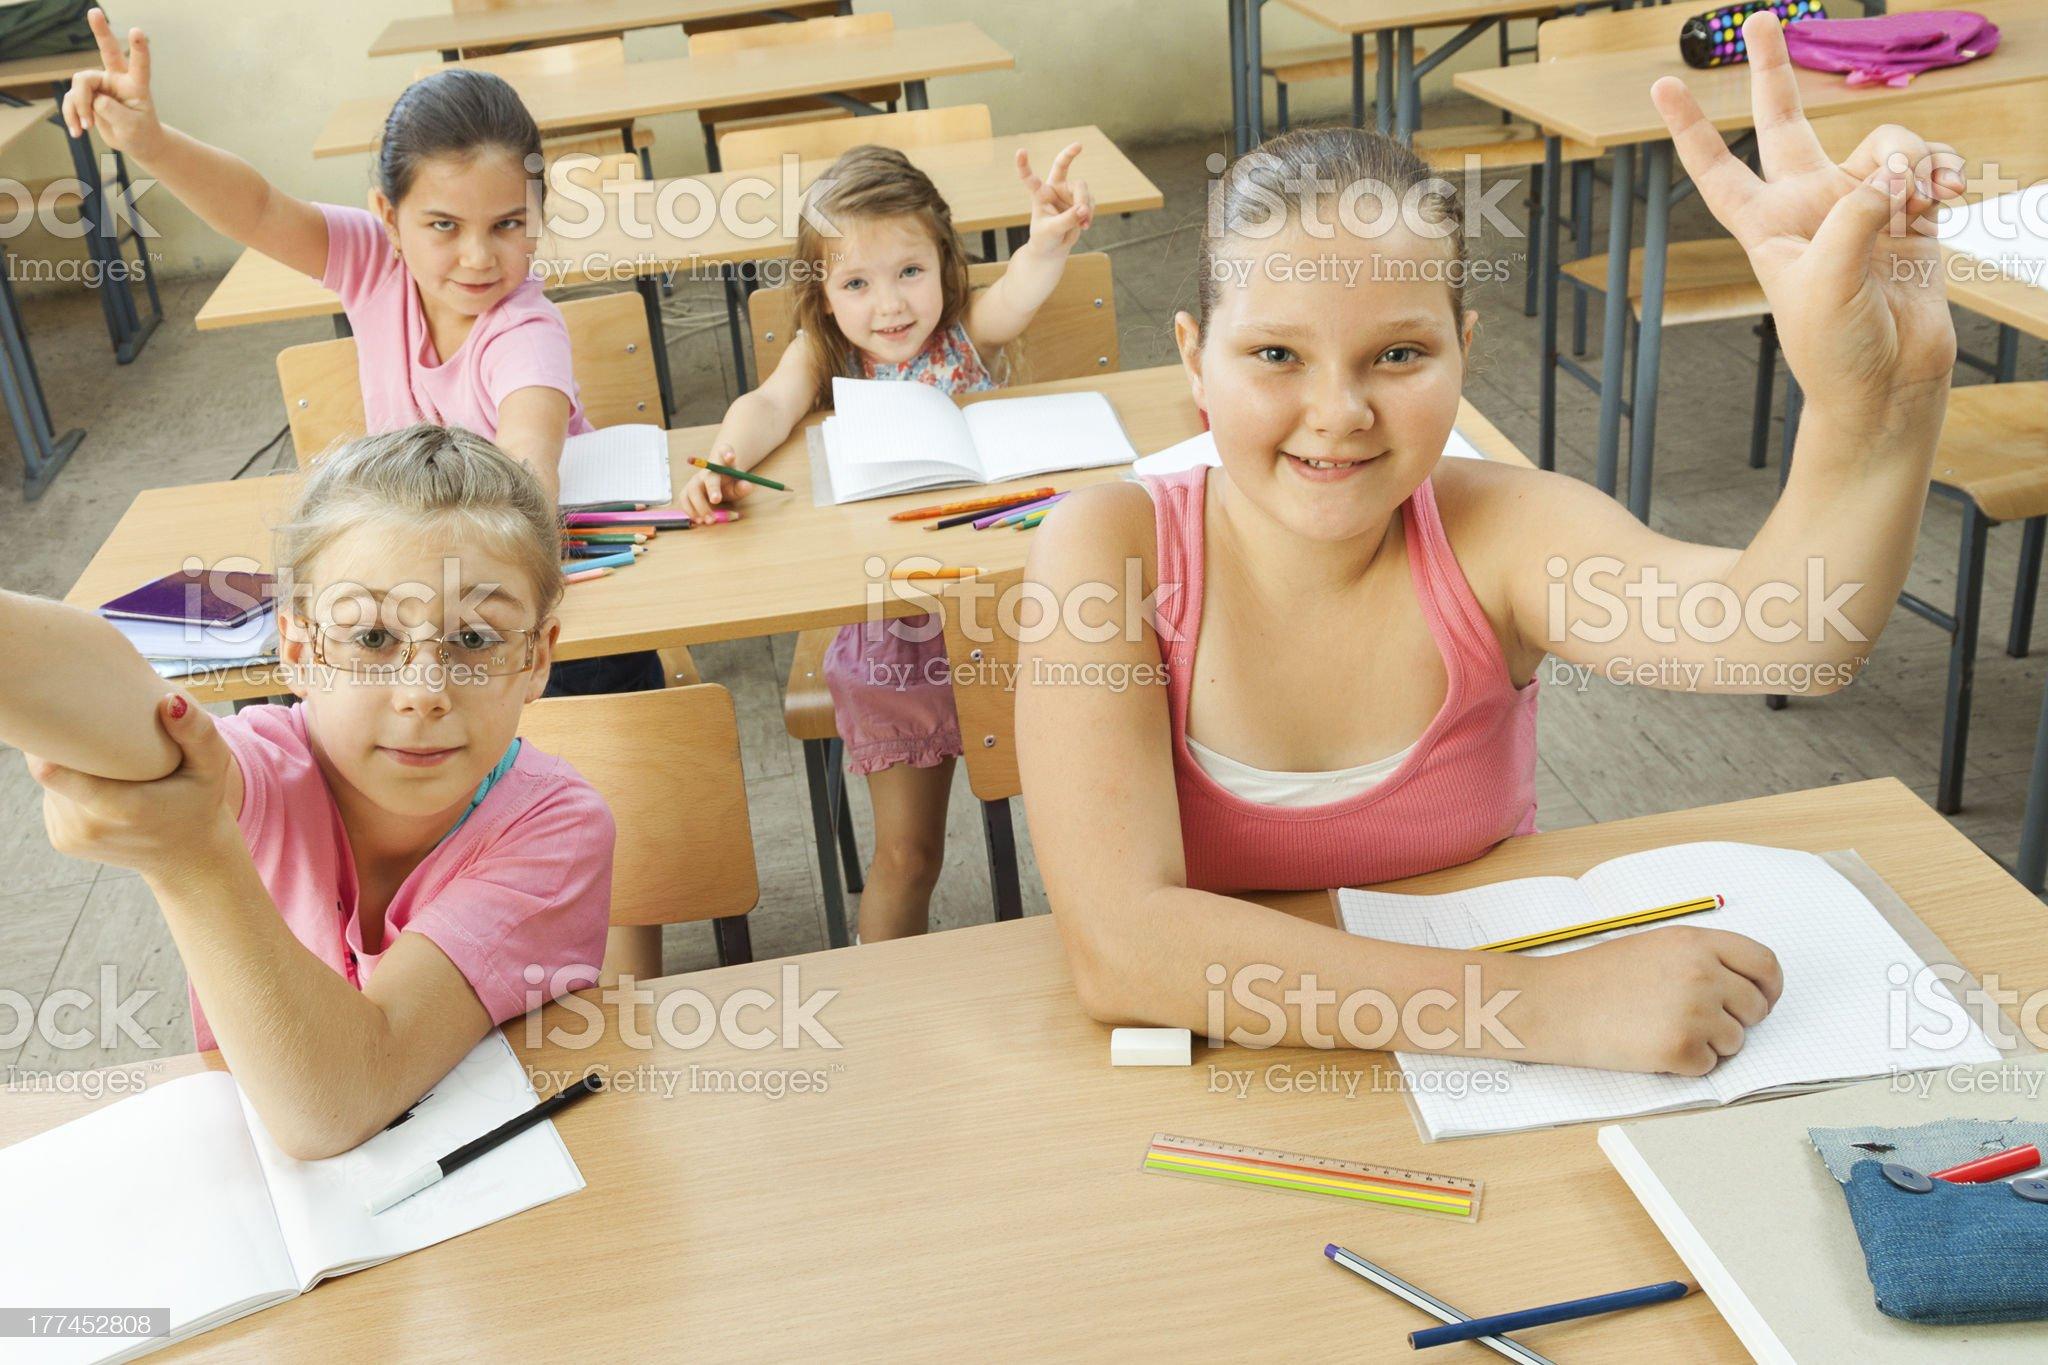 Elementary School Students at Classroom Desks royalty-free stock photo